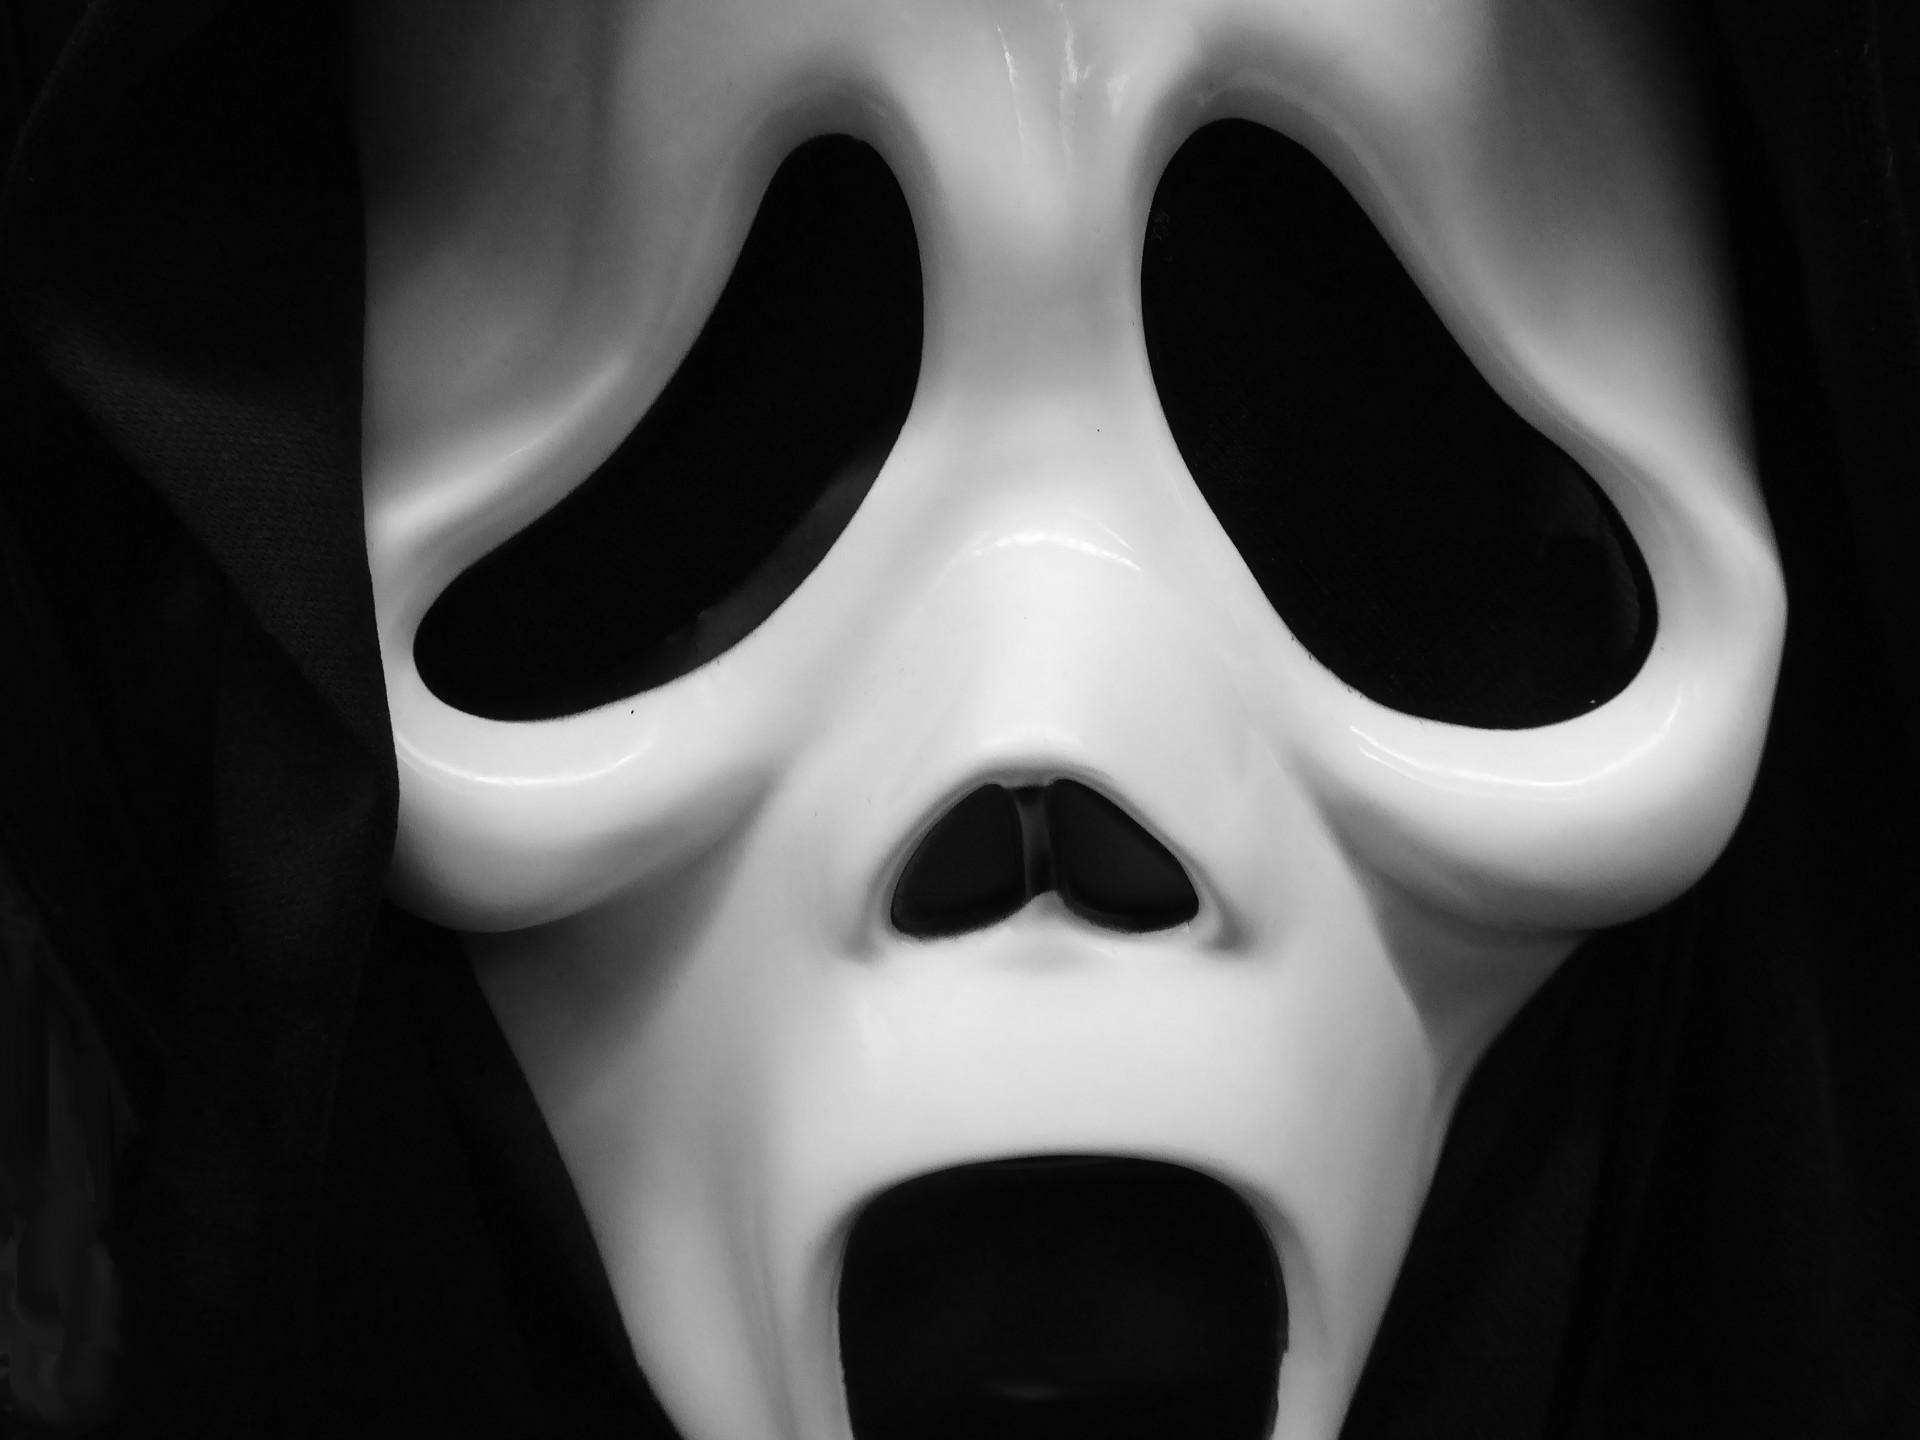 Ghostface Serial Killer